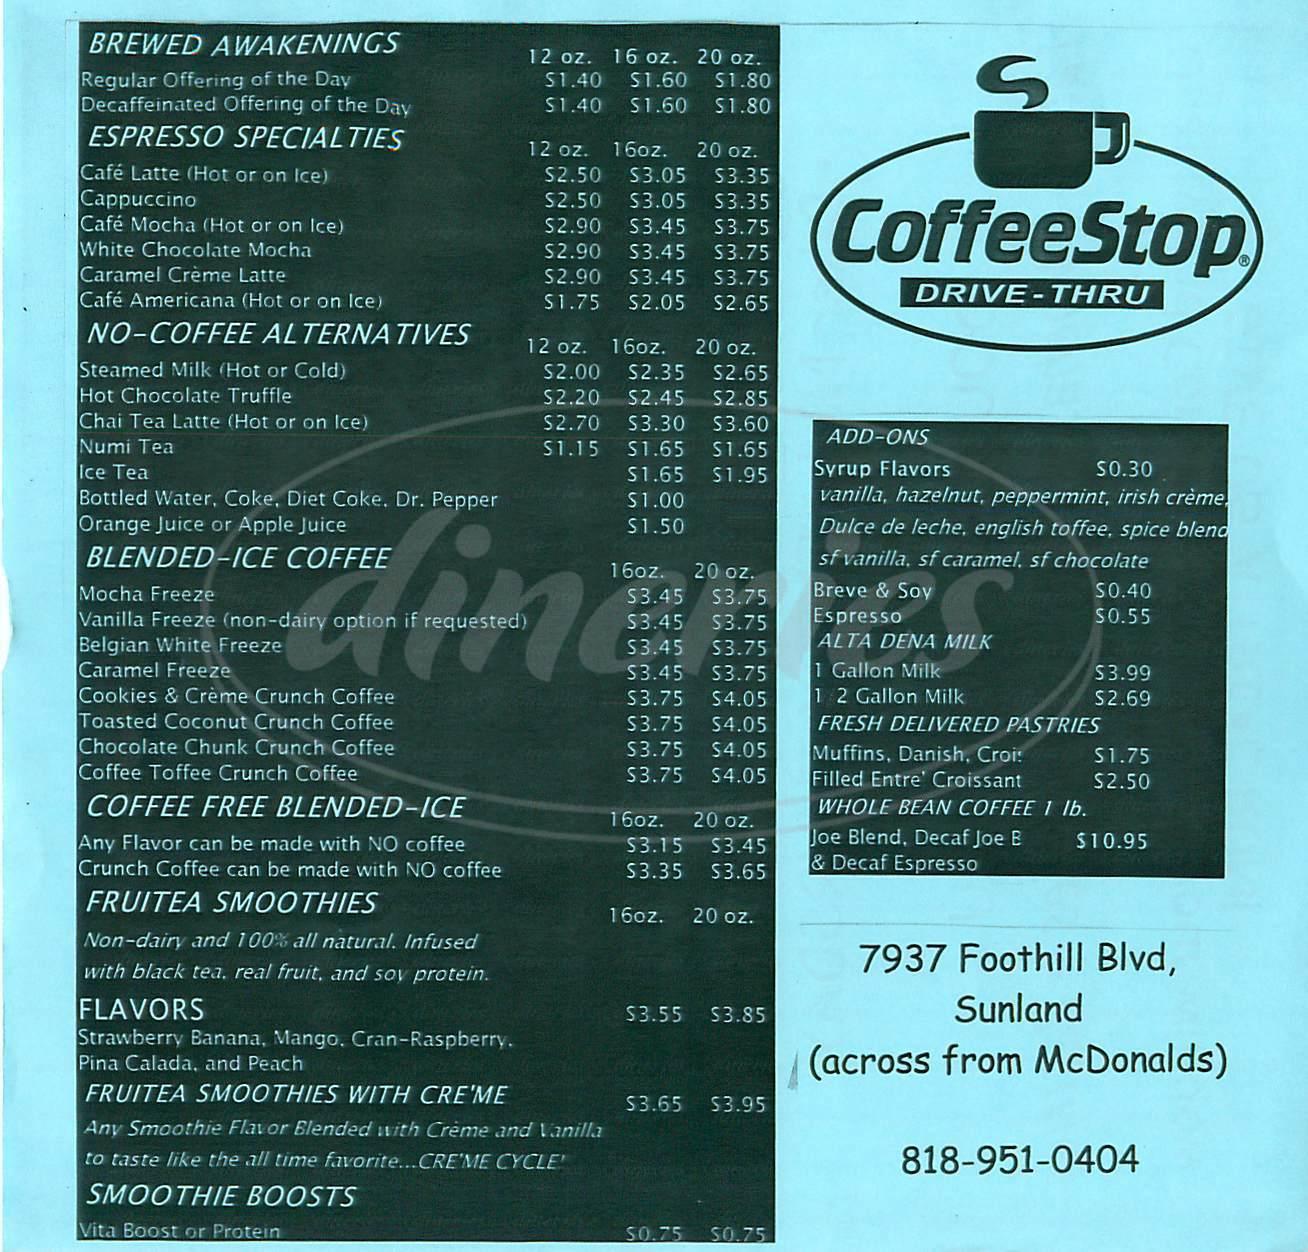 menu for Coffee Stop Drive Thru